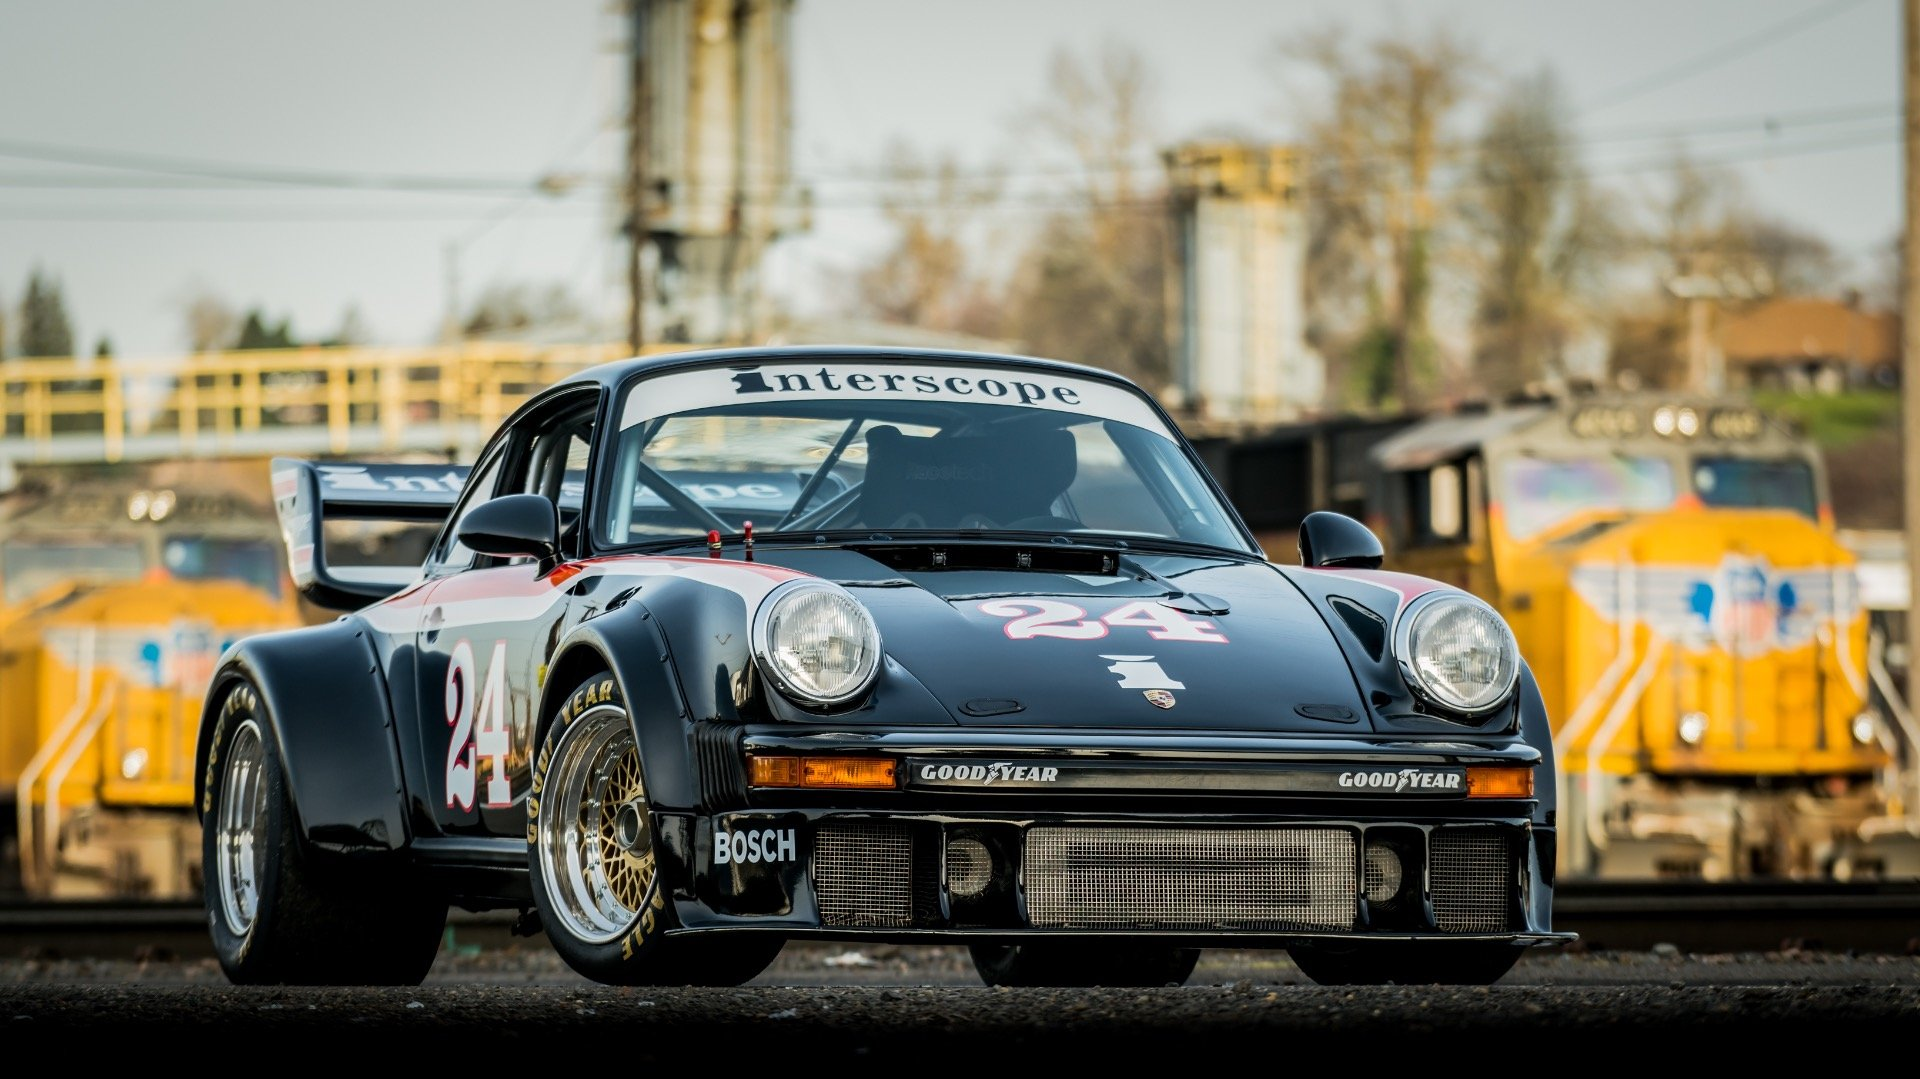 1986 Porsche Interscope 934.5 Race Car $127k spent  $159.9 For Sale (picture 2 of 6)